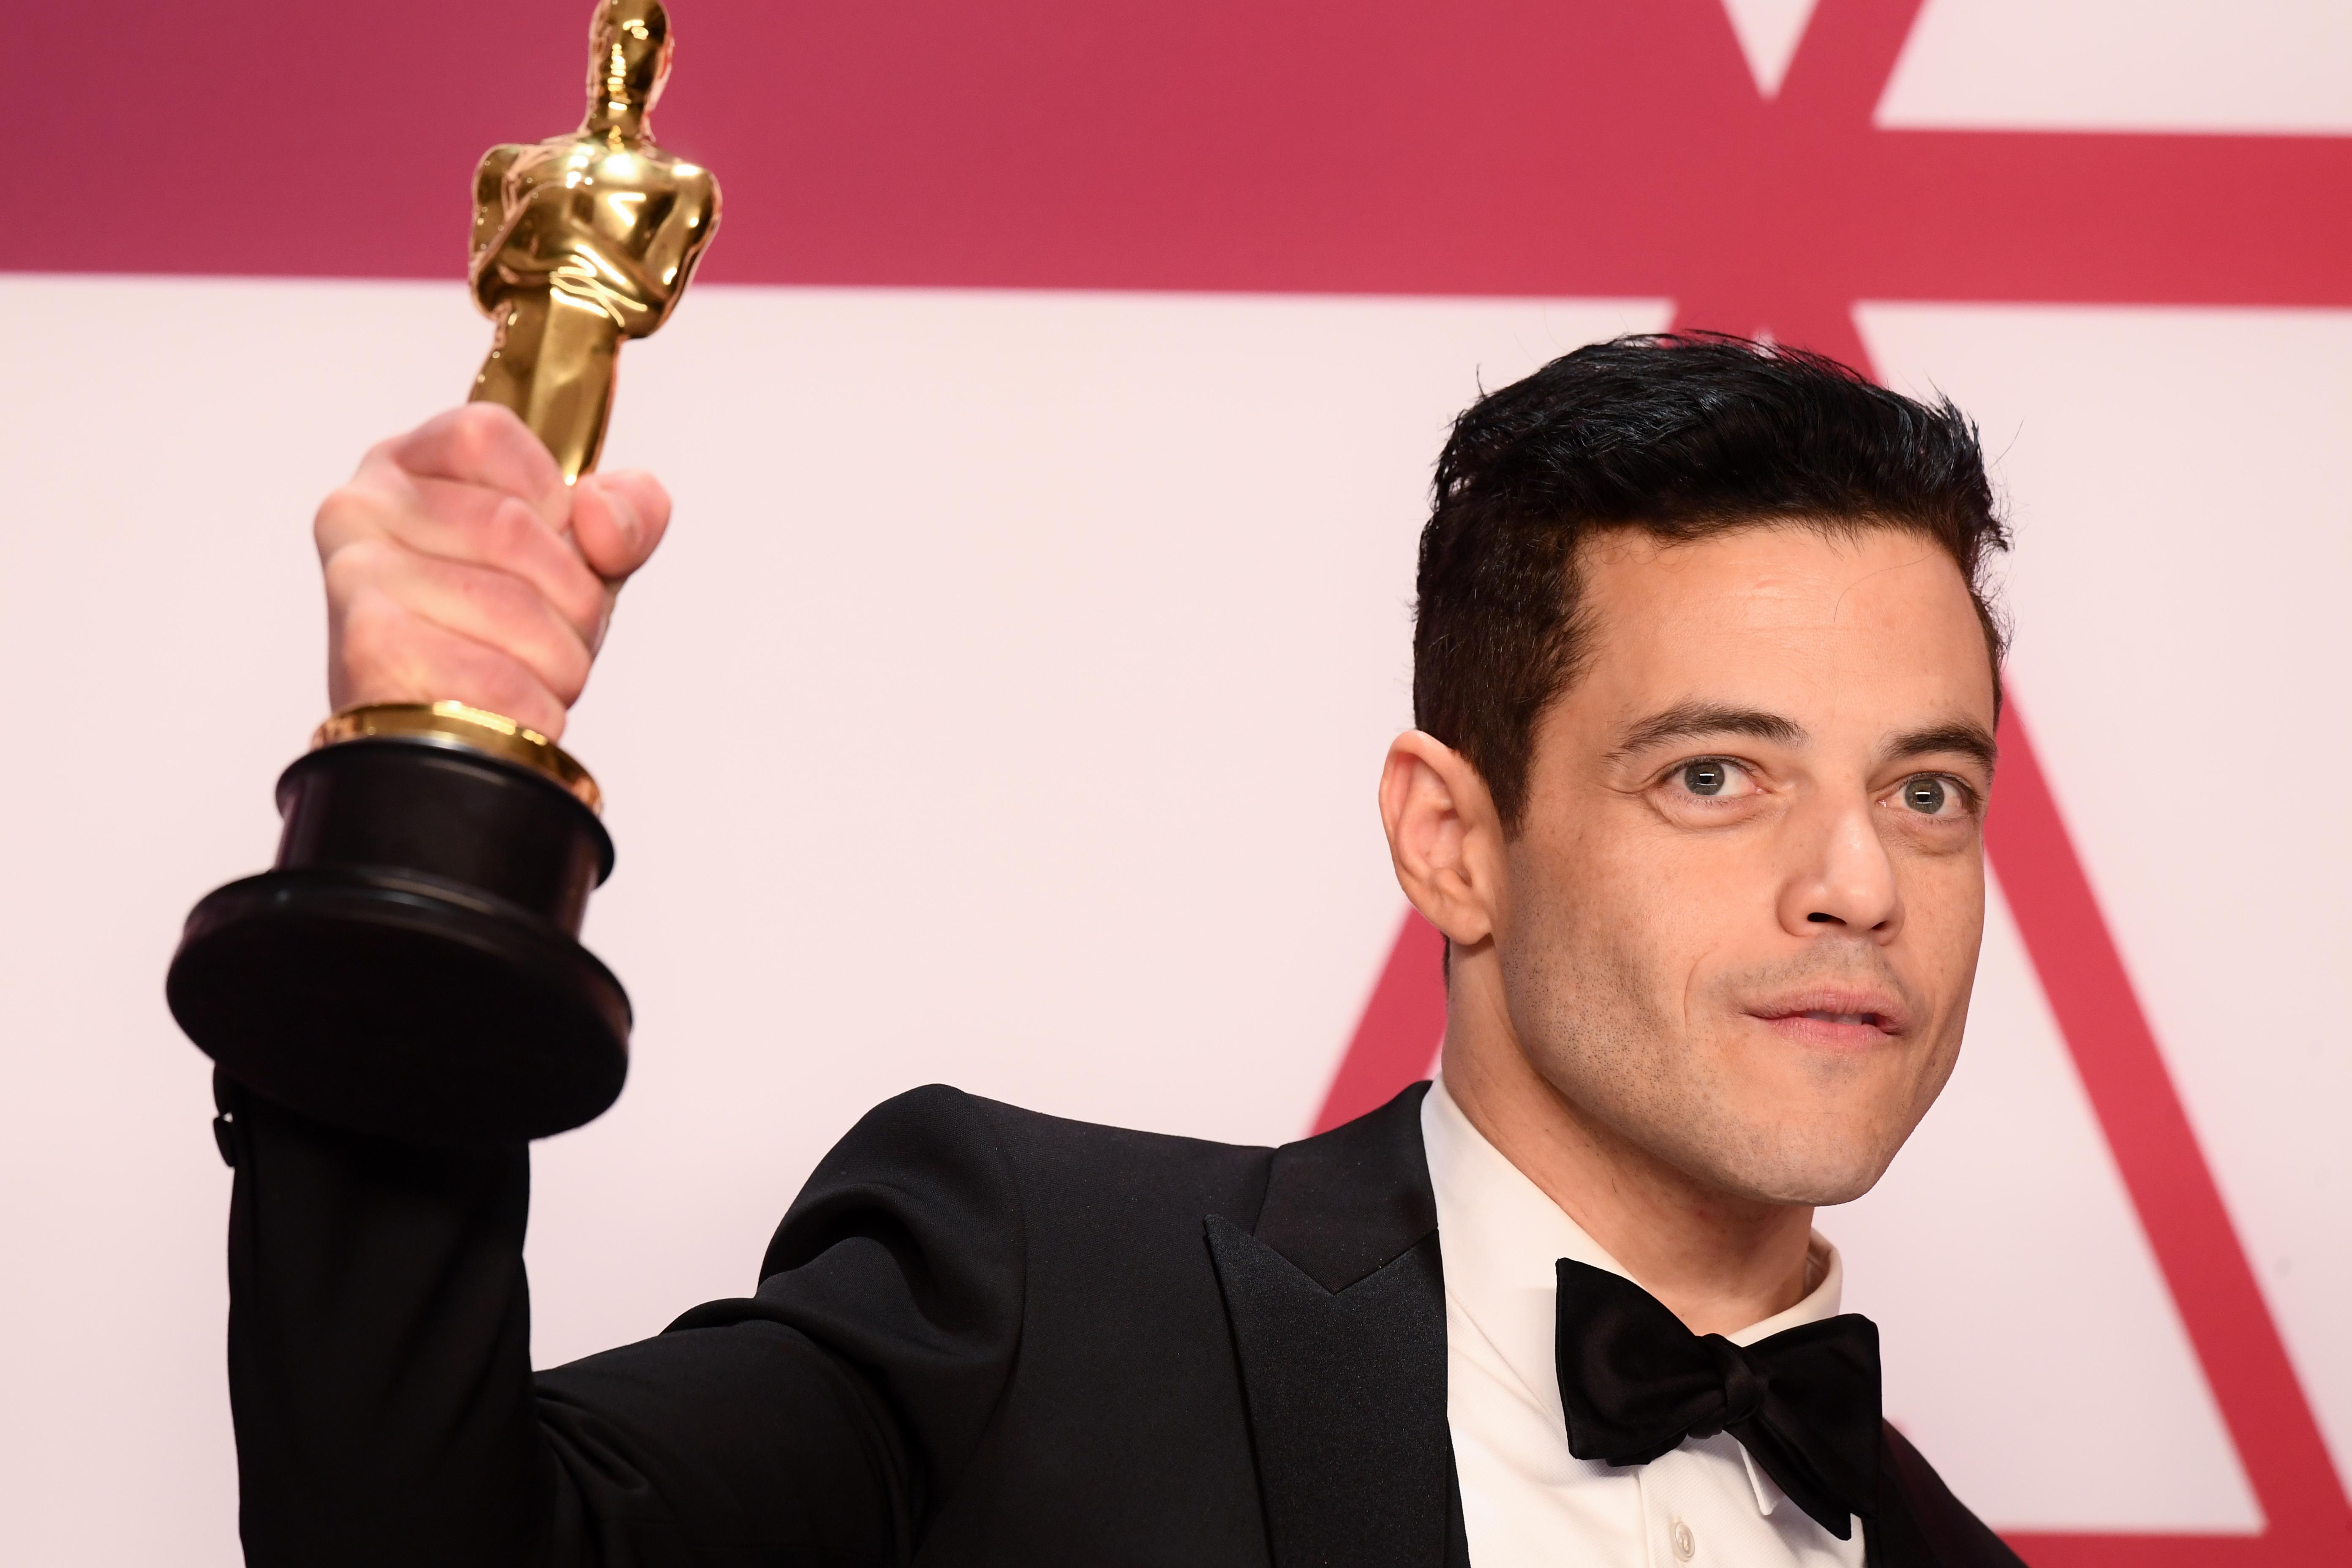 Rami Malek - Lead Actor - 'Bohemian Rhapsody'91st Annual Academy Awards, Press Room, Los Angeles, USA - 24 Feb 2019